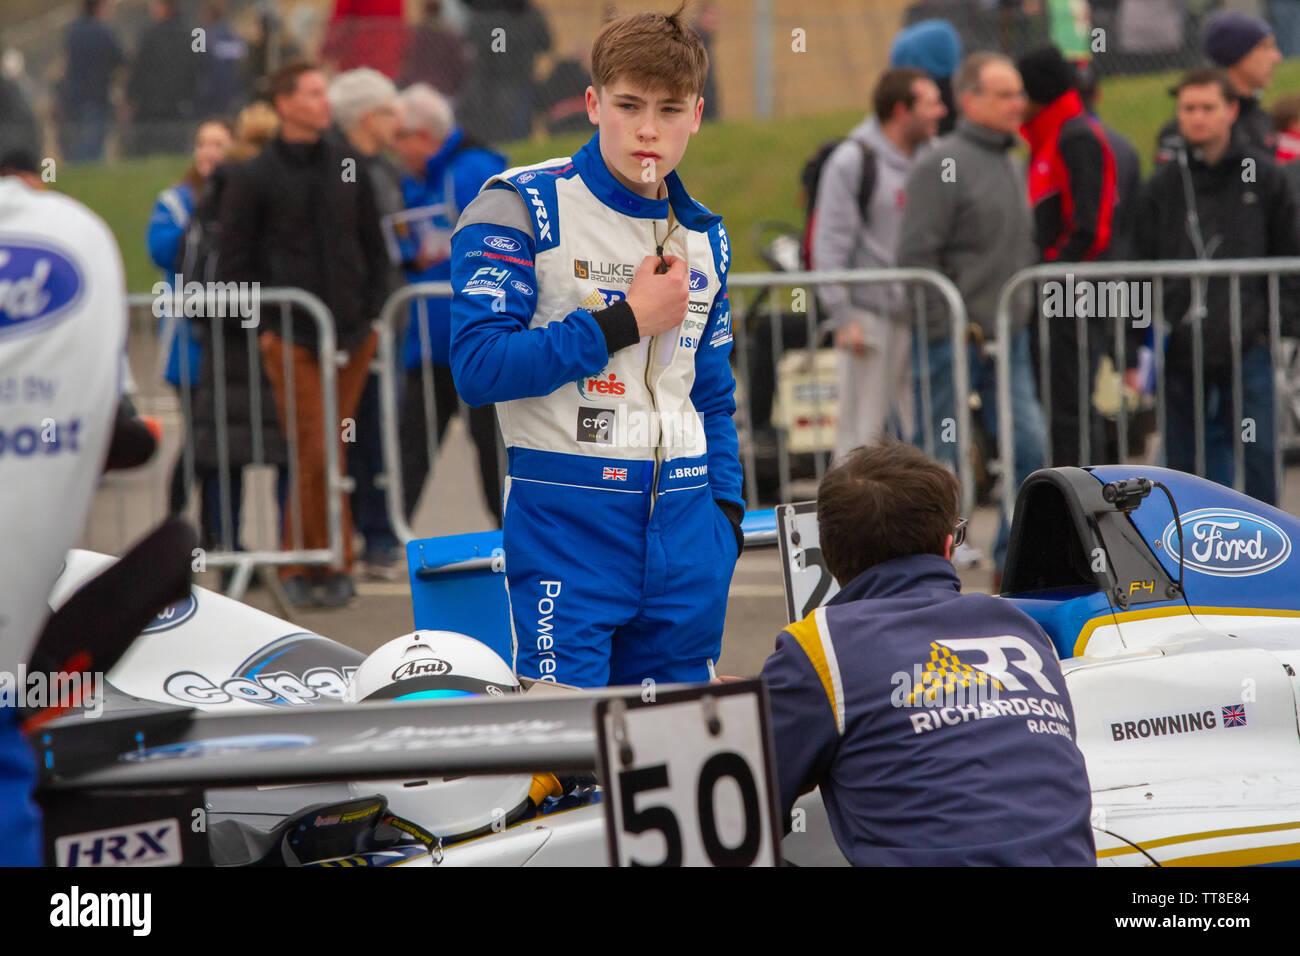 Luke Browning, British racing driver. British Formula 4 paddock, after qualifying at Brands Hatch - Stock Image